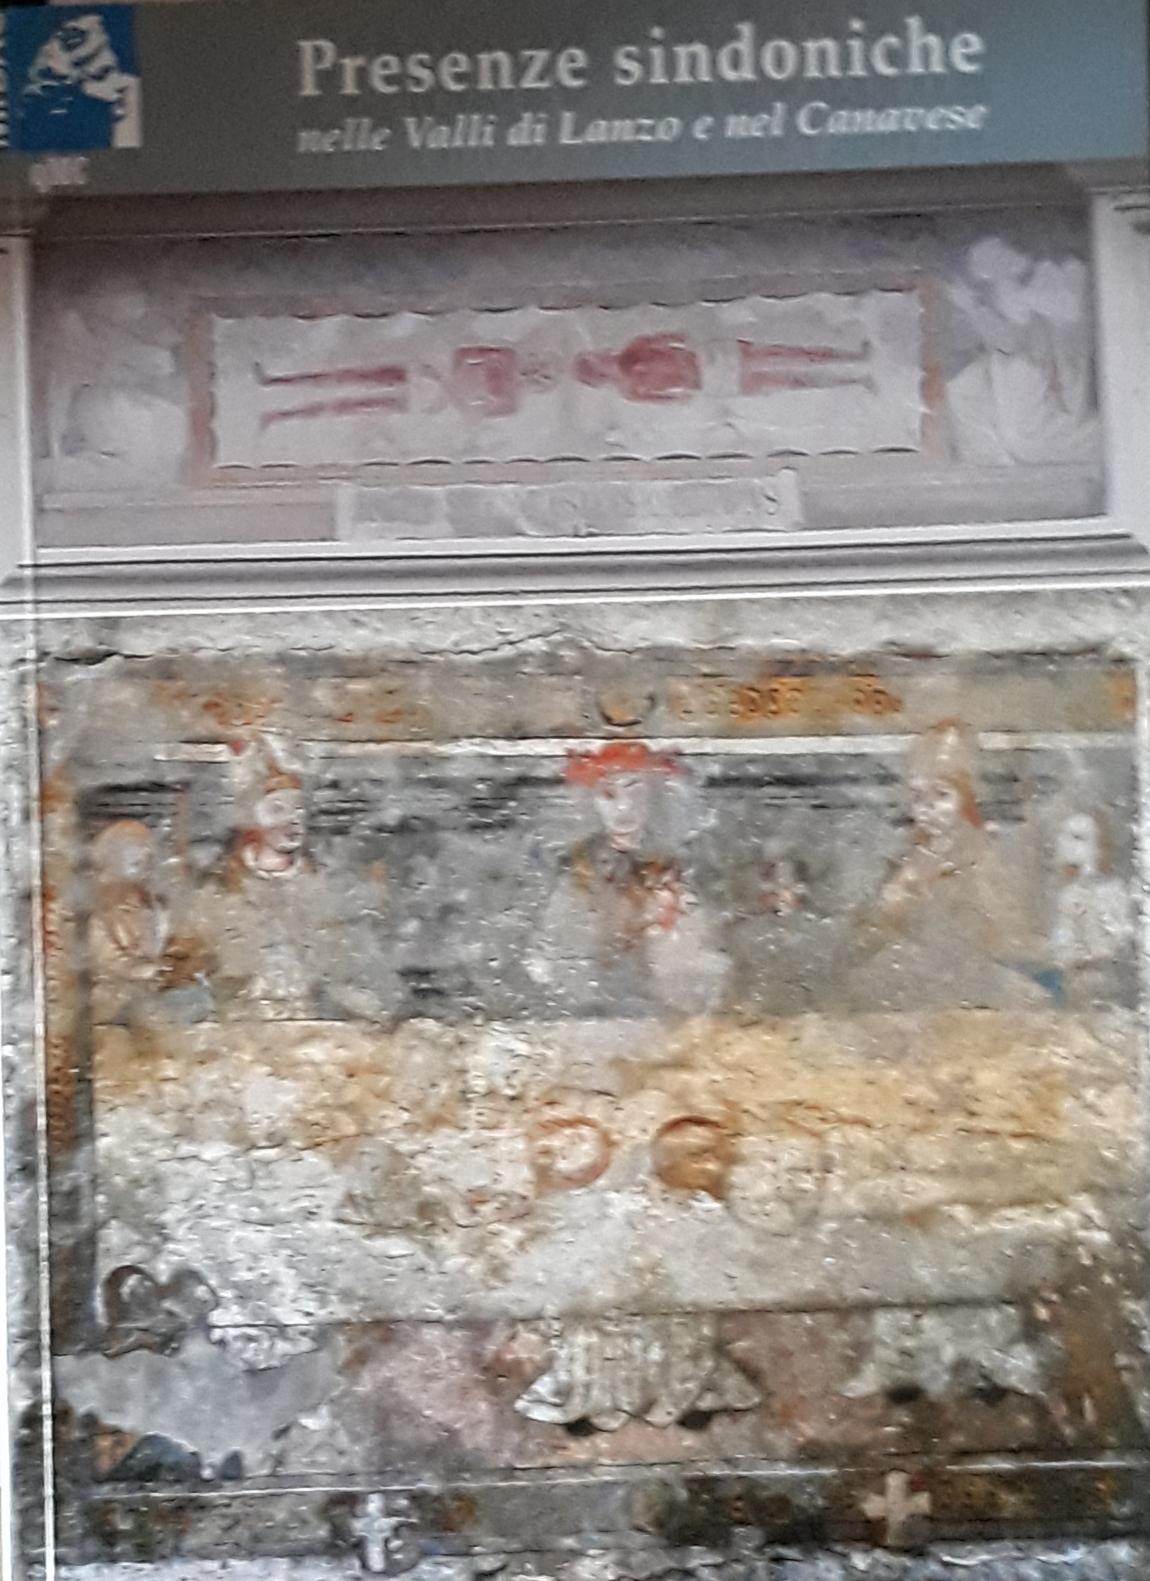 Presenze sindoniche in Canavese e Valli di Lanzo